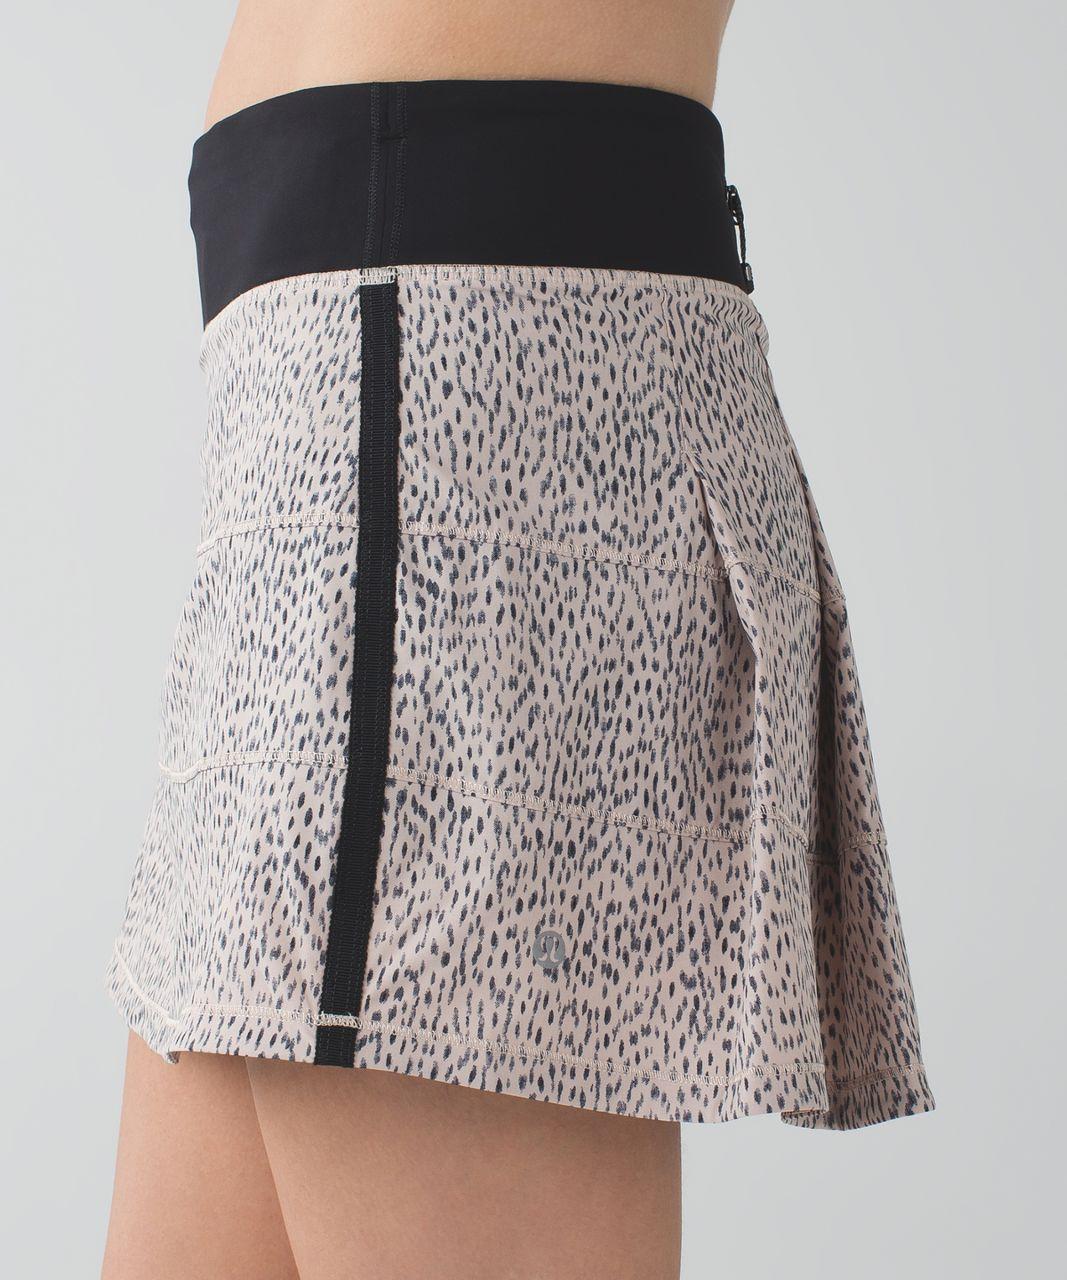 Lululemon Pace Rival Skirt II *4-way Stretch (Tall) - Dottie Dash Grain Black / Black